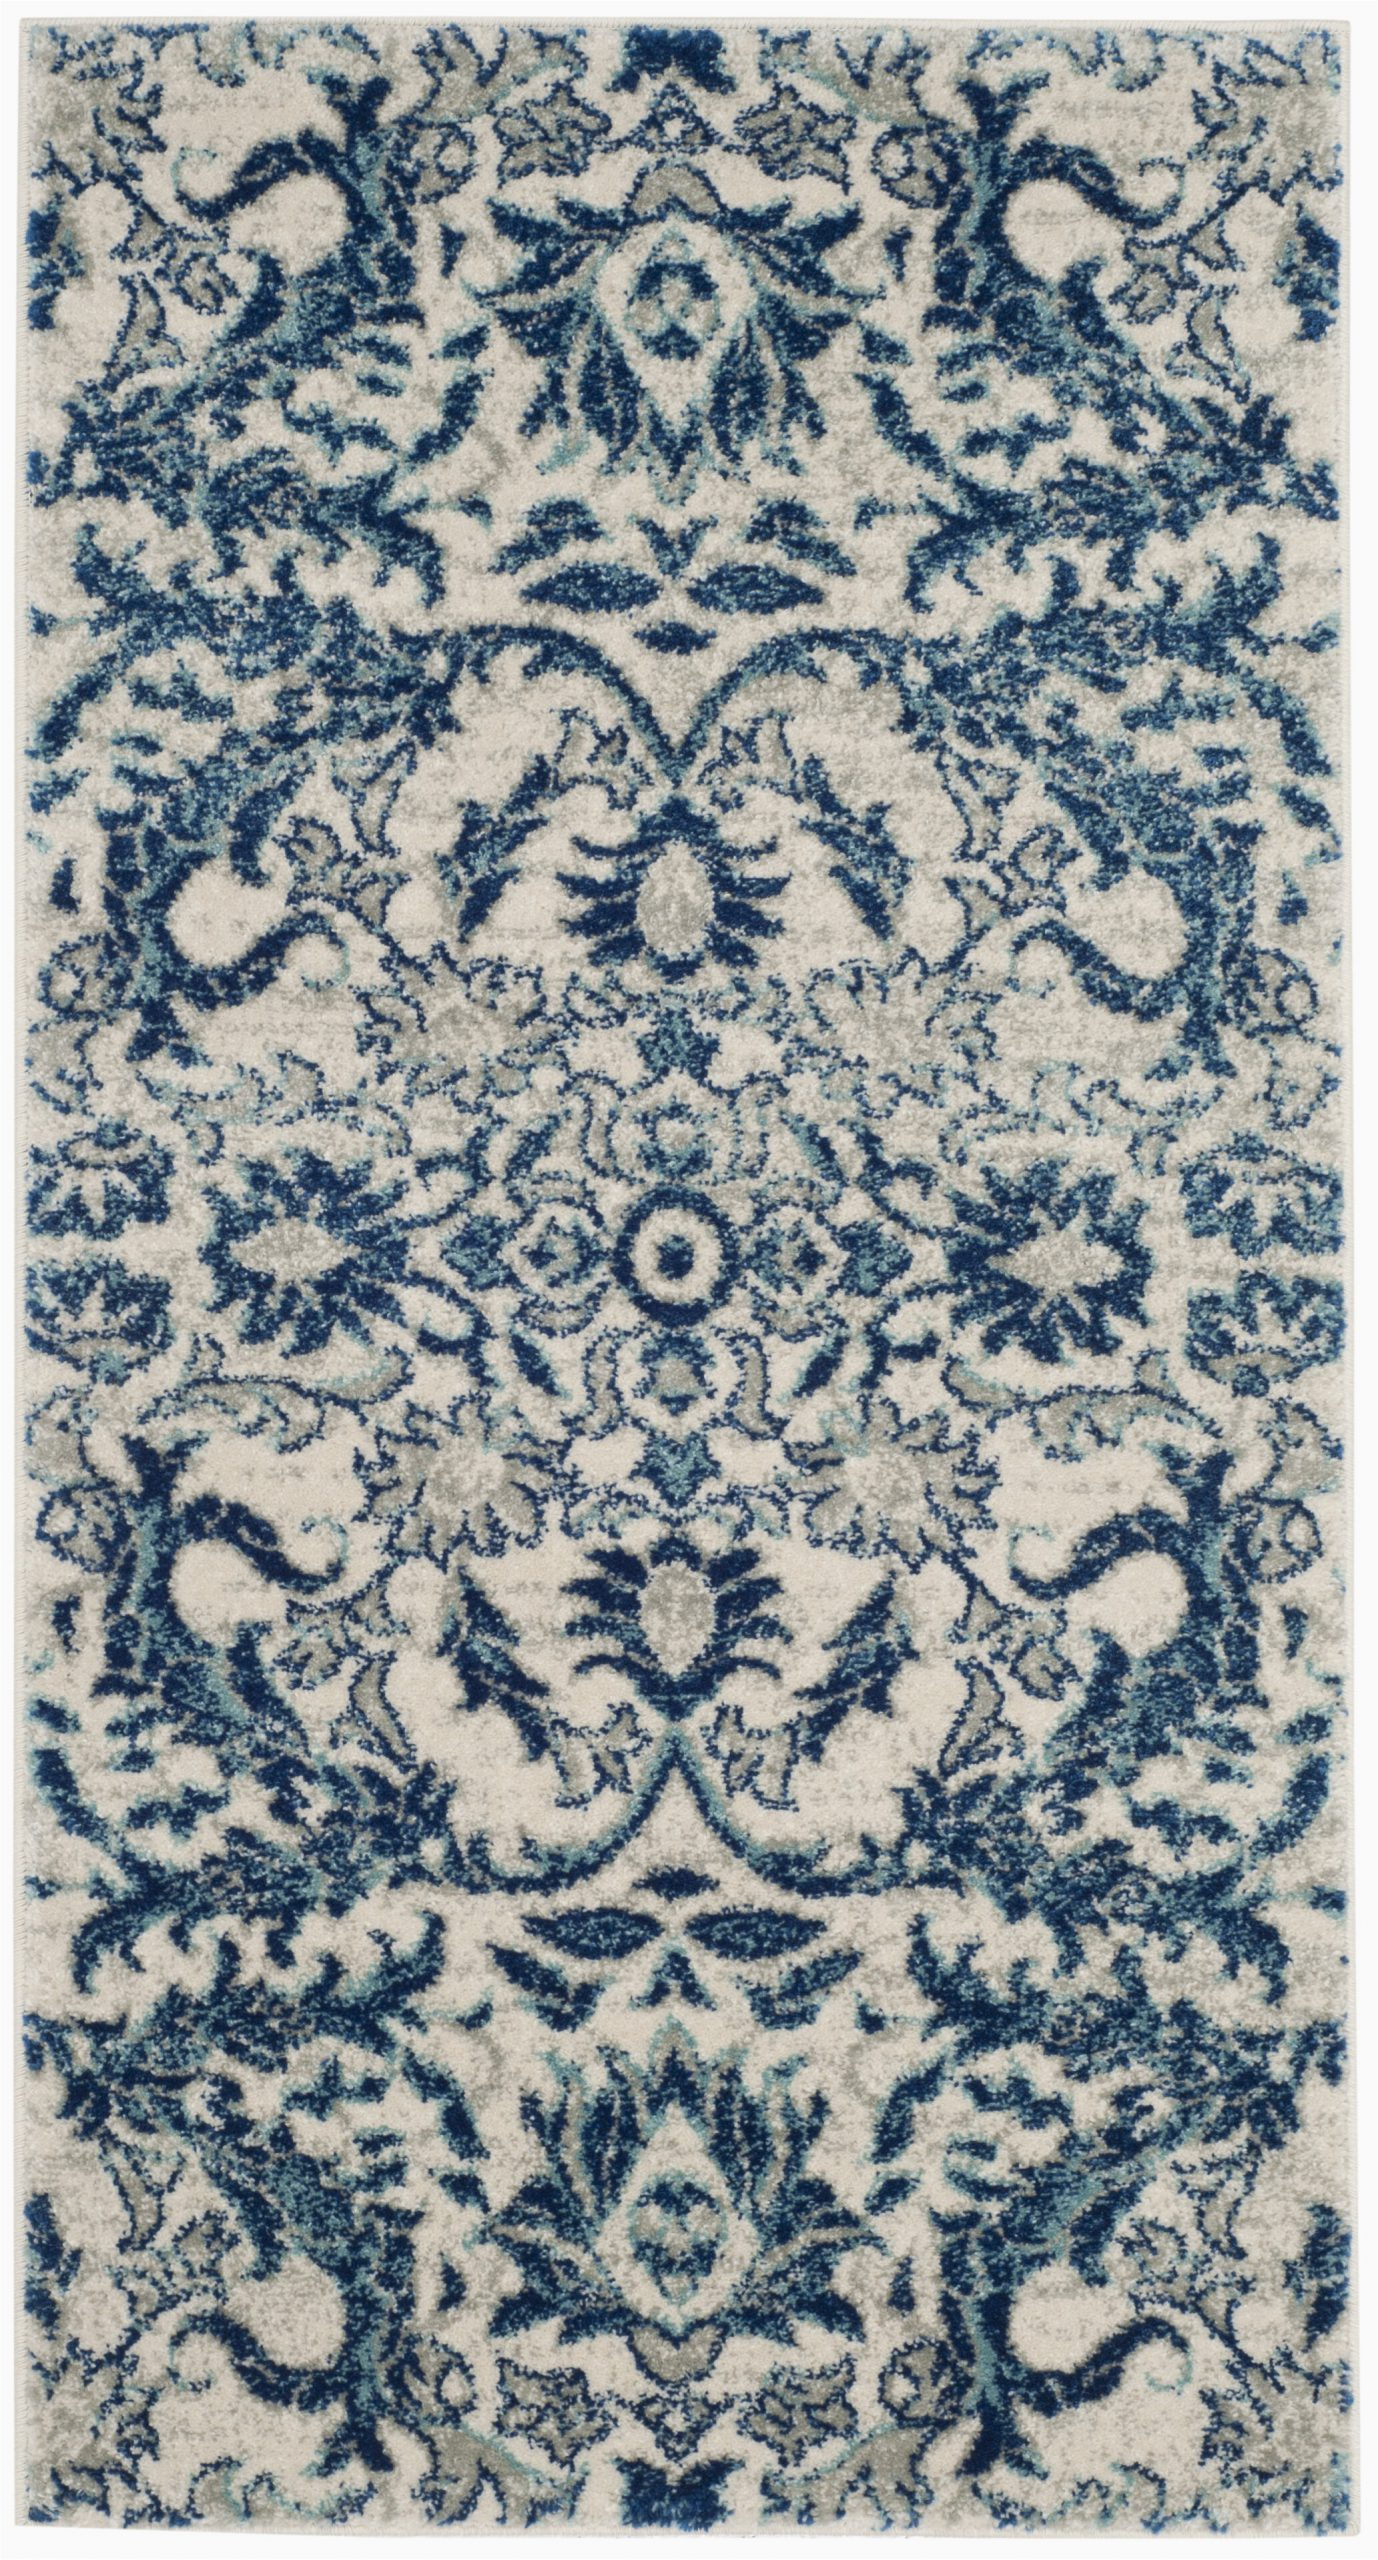 hayley ivory blue area rug lark1962 piid= &ds=